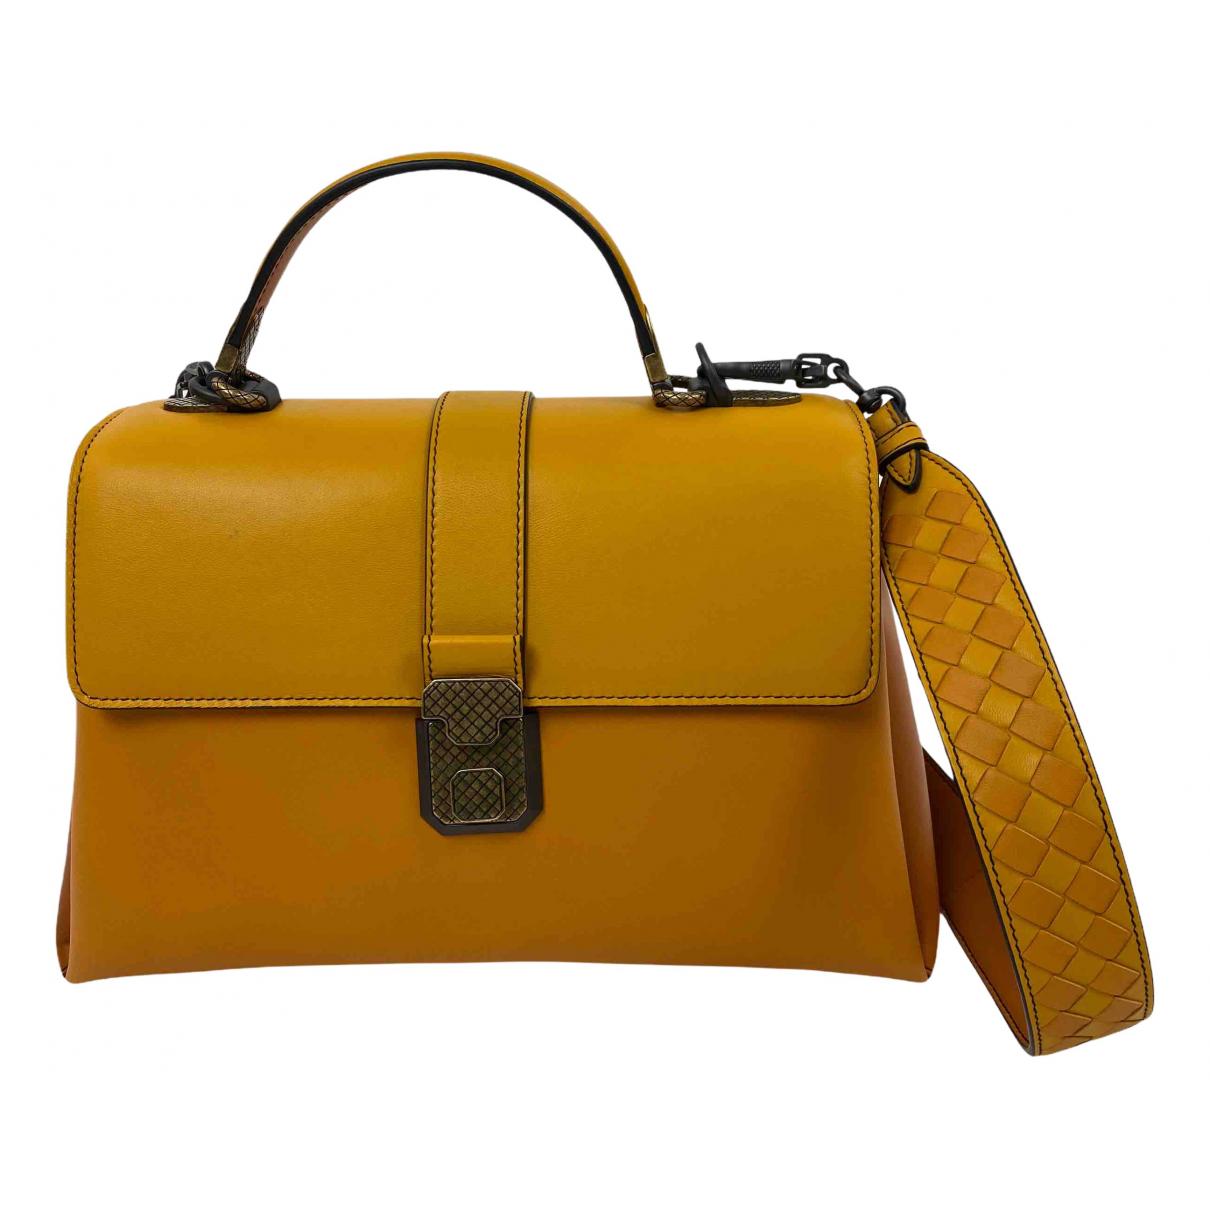 Bottega Veneta - Sac a main Piazza pour femme en cuir - jaune